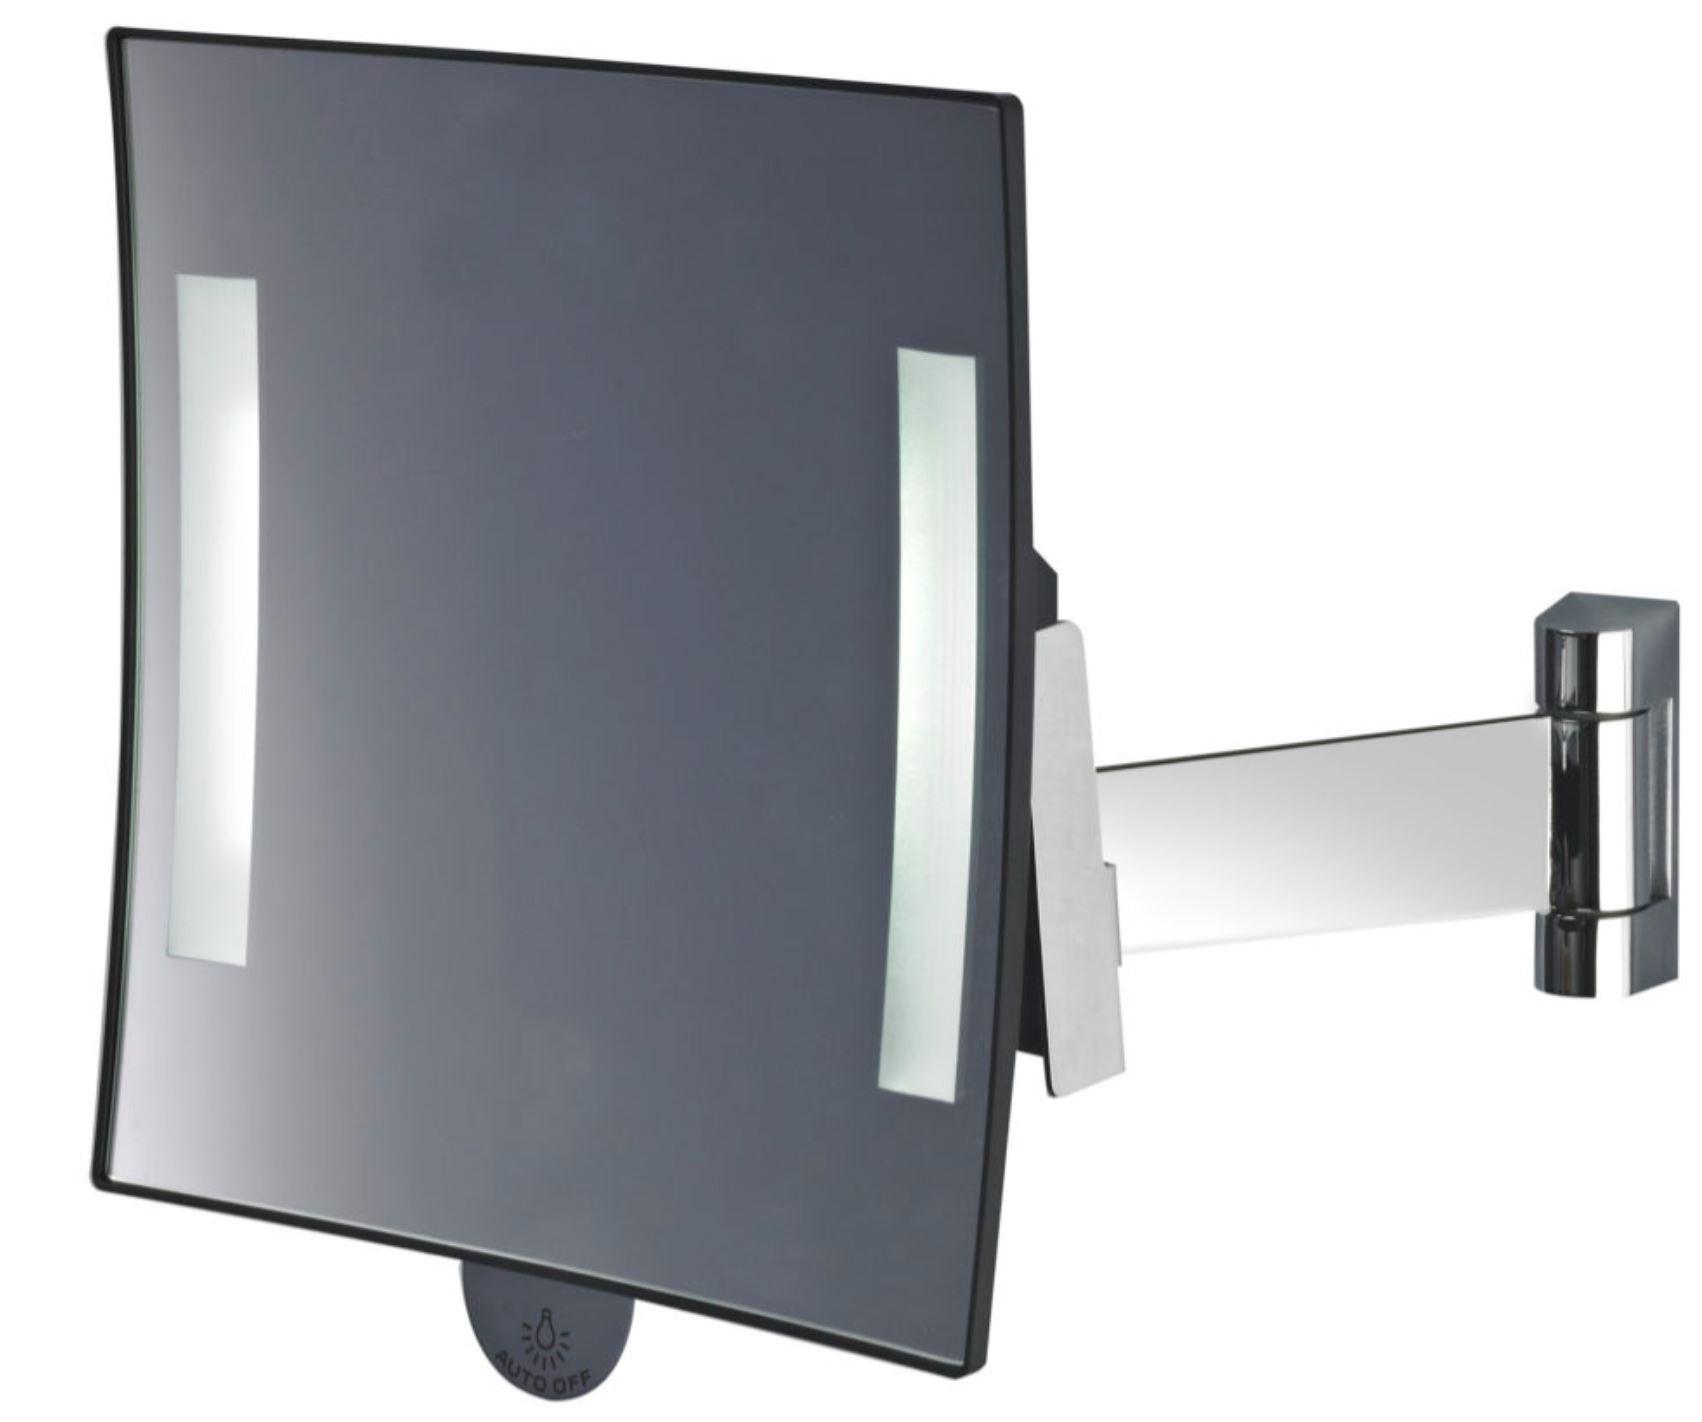 miroir grossissant lumineux carr jvd galaxy chrome. Black Bedroom Furniture Sets. Home Design Ideas